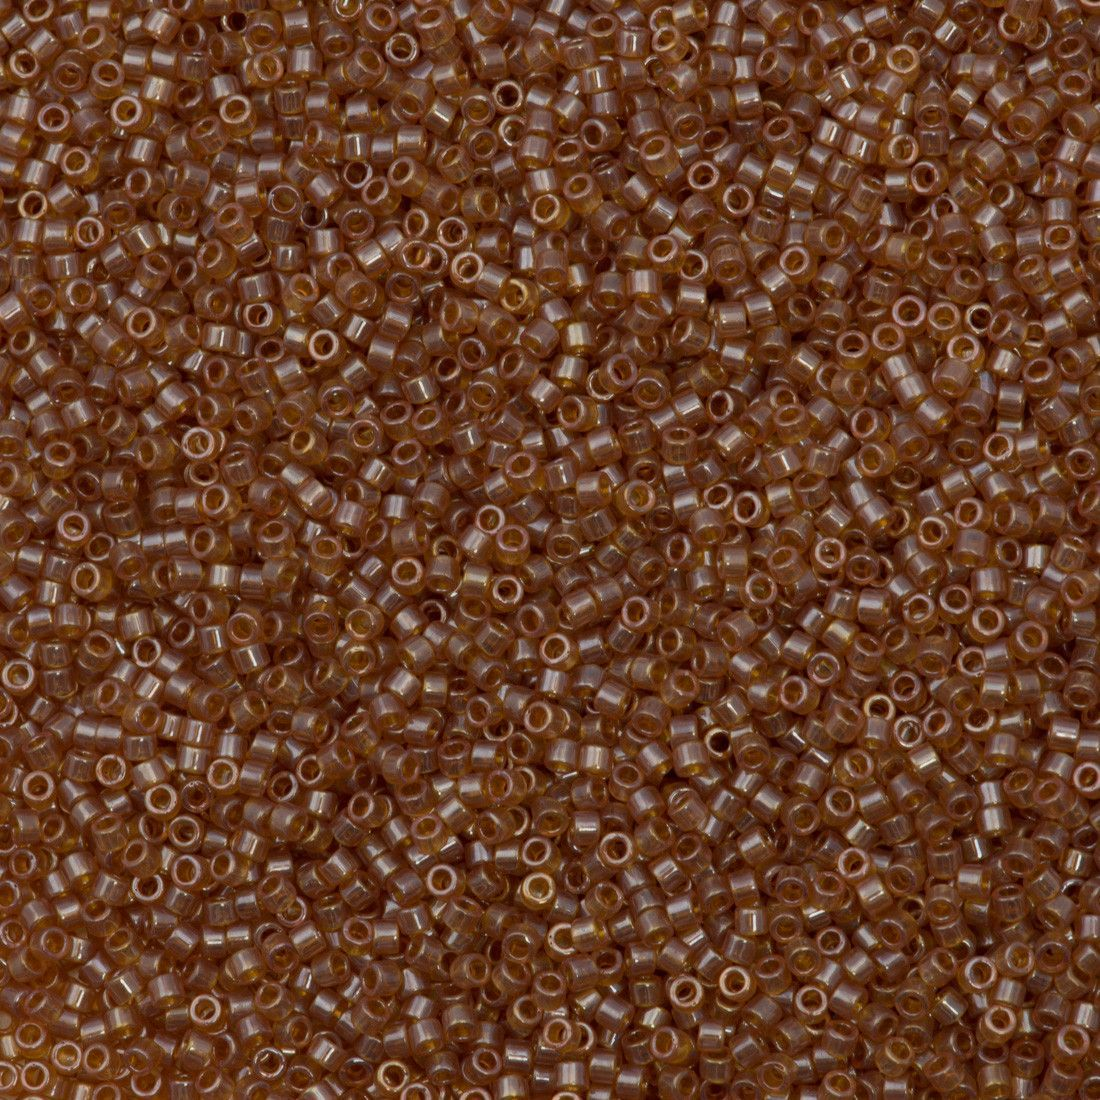 Miyuki Delica Seed Bead 11/0 Transparent Topaz Luster 5g DB1221